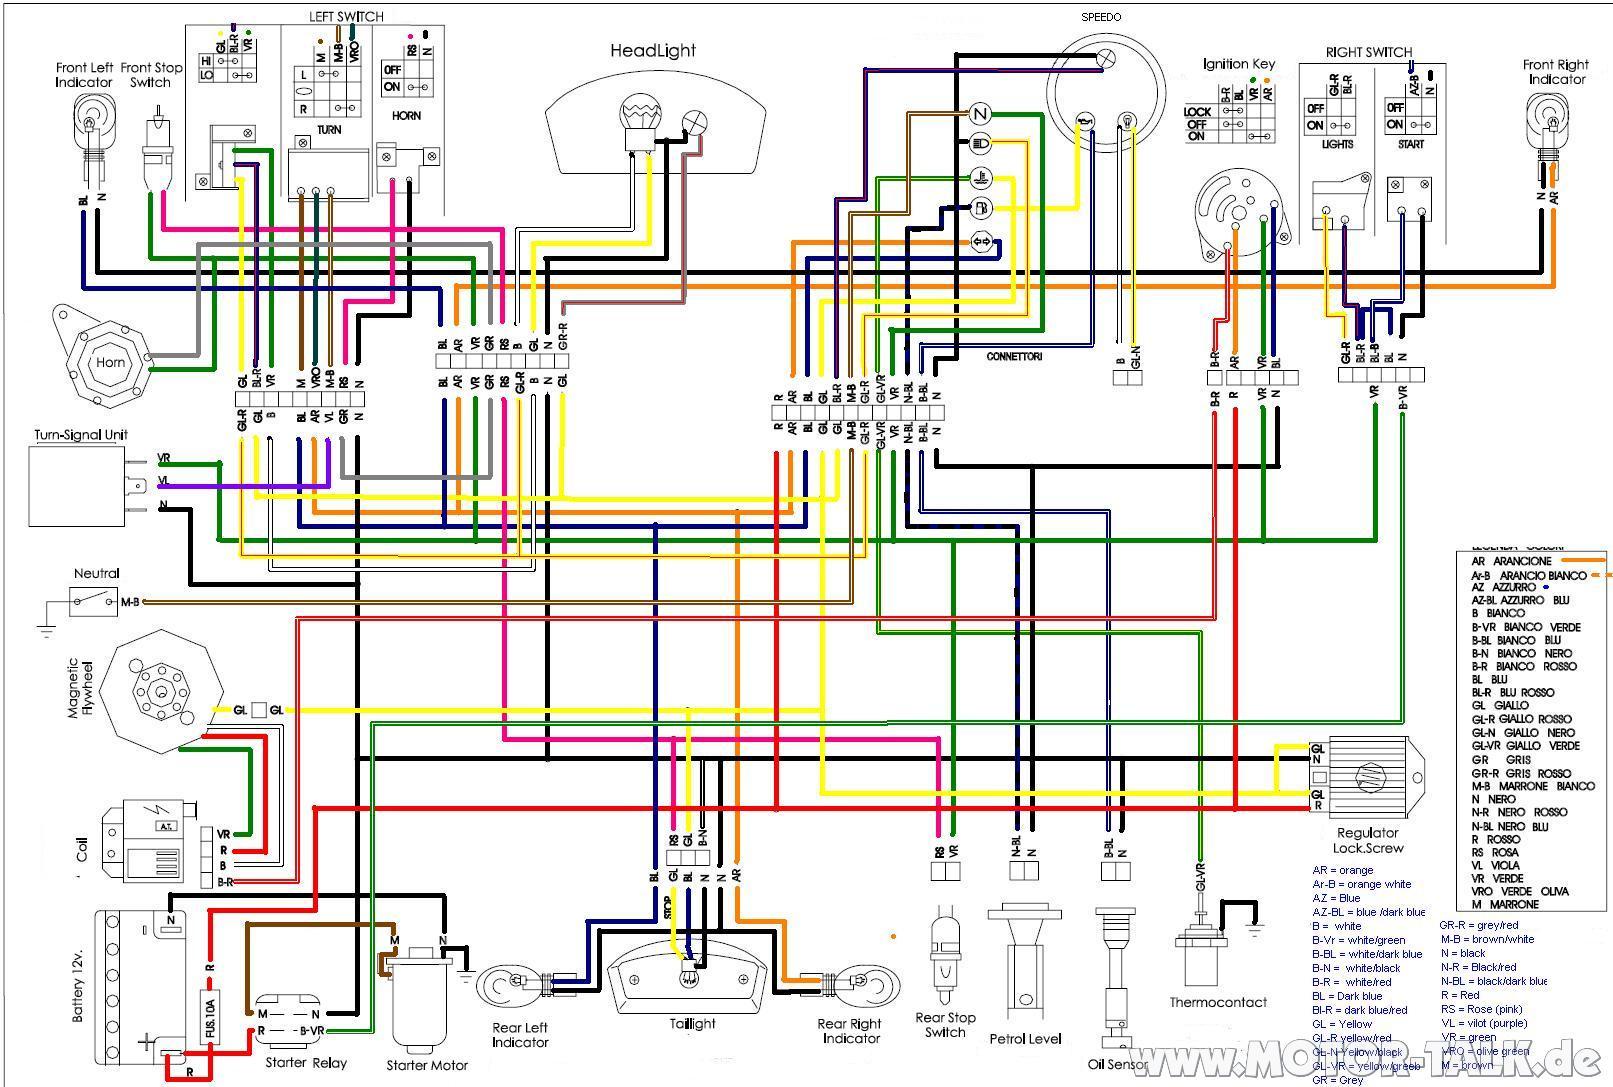 DIAGRAM 110 Atv Stator Wiring Diagram FULL Version HD Quality Wiring  Diagram - FREDDIESTRANSMISSION.CAUSSES-EN-AILES.FR [ 1087 x 1613 Pixel ]